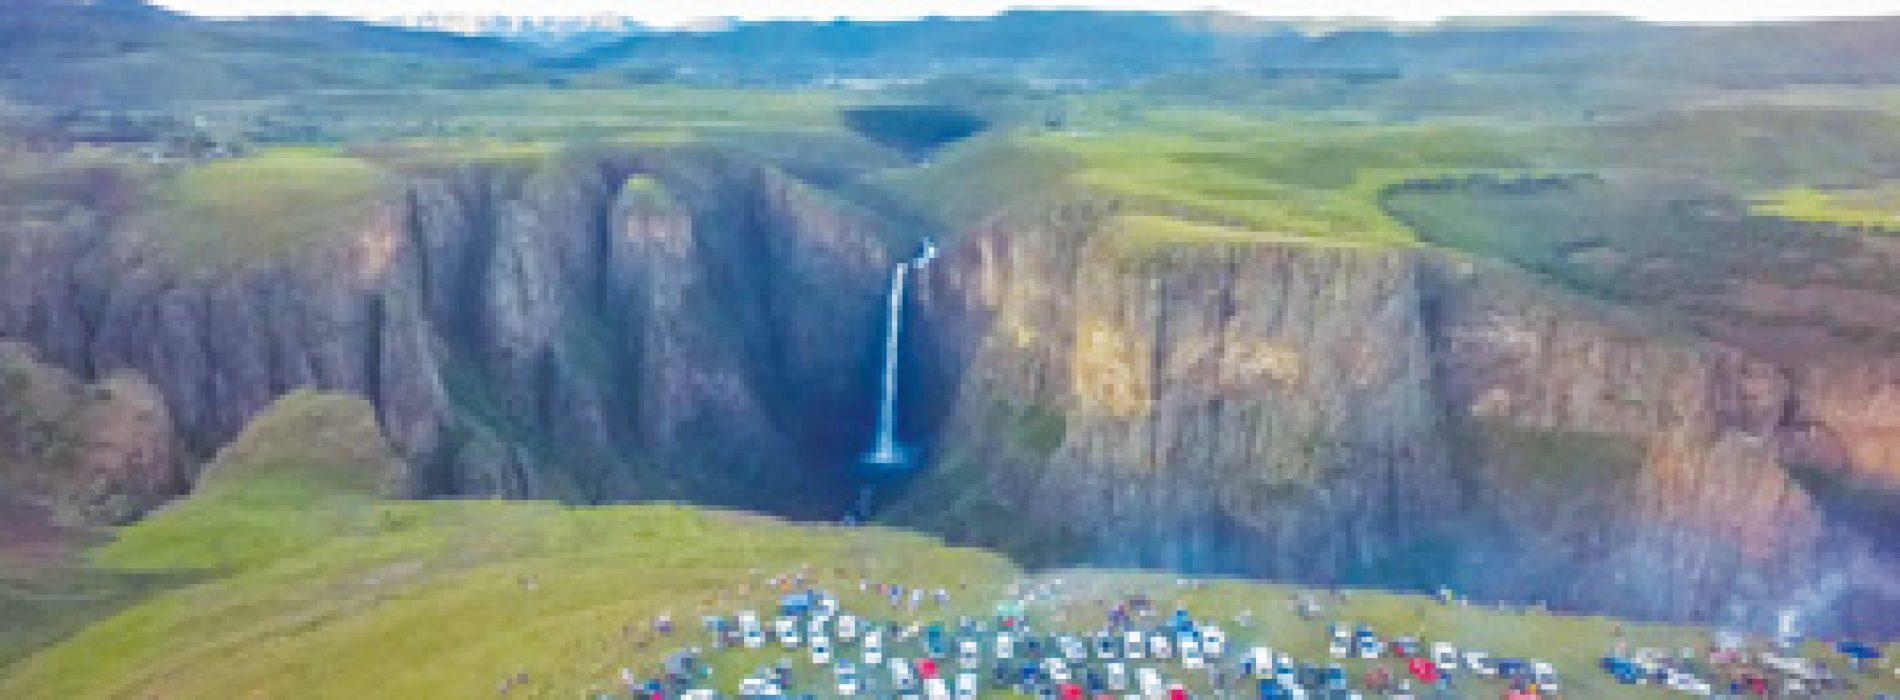 Malentsunyane braai festival organisers nailed it